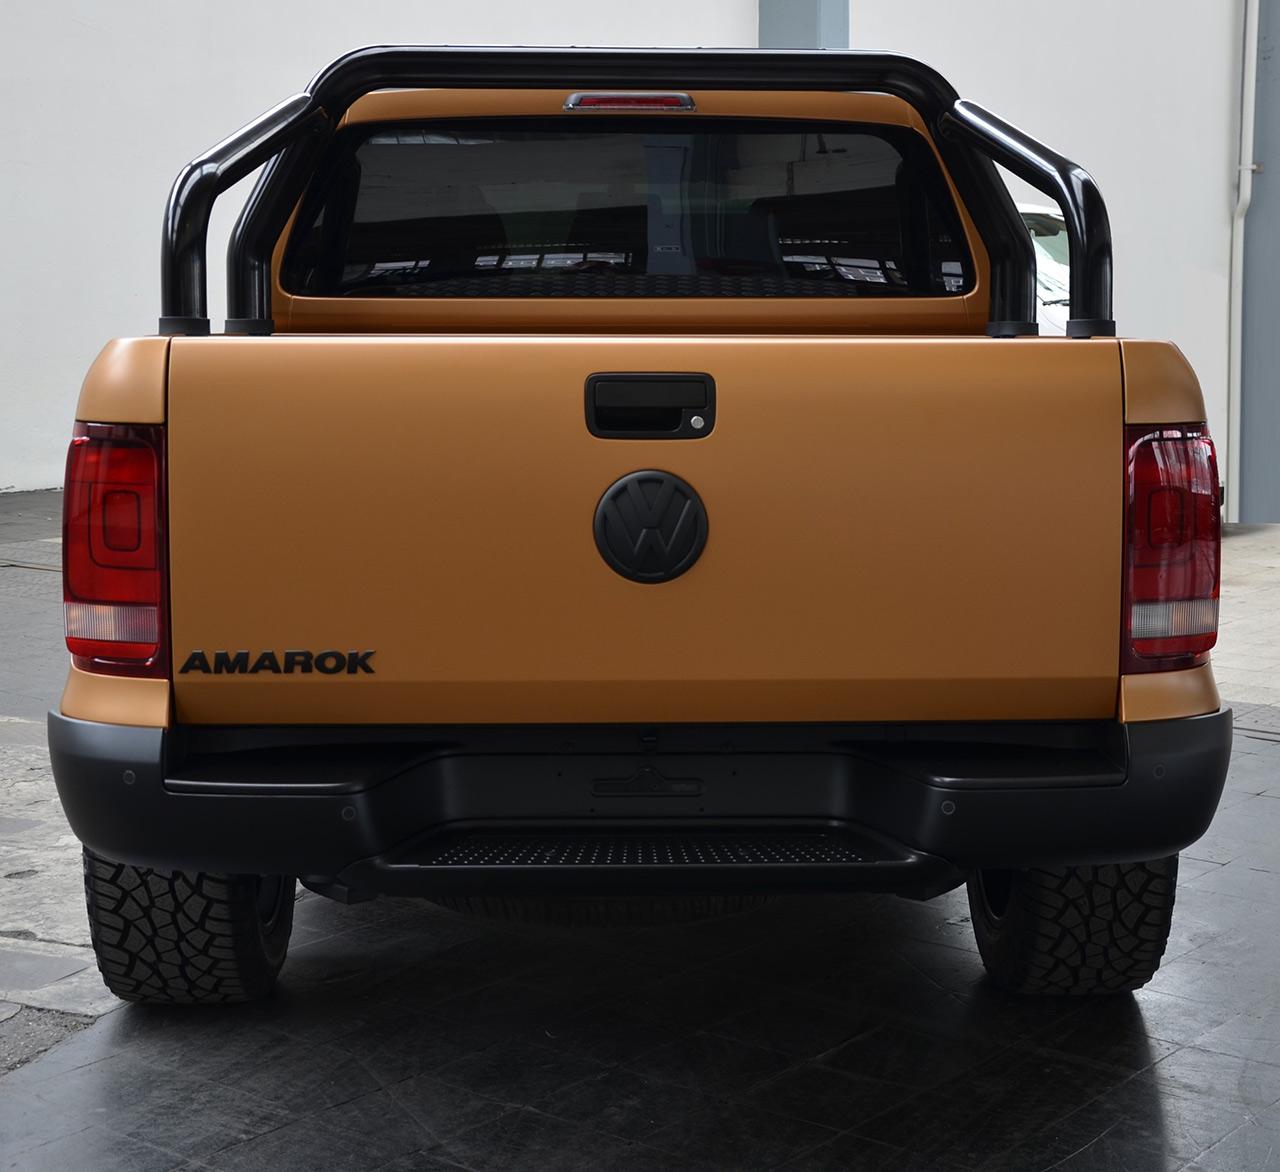 amarok v8 passion desert 3 MTM VW Amarok V8 Passion Desert